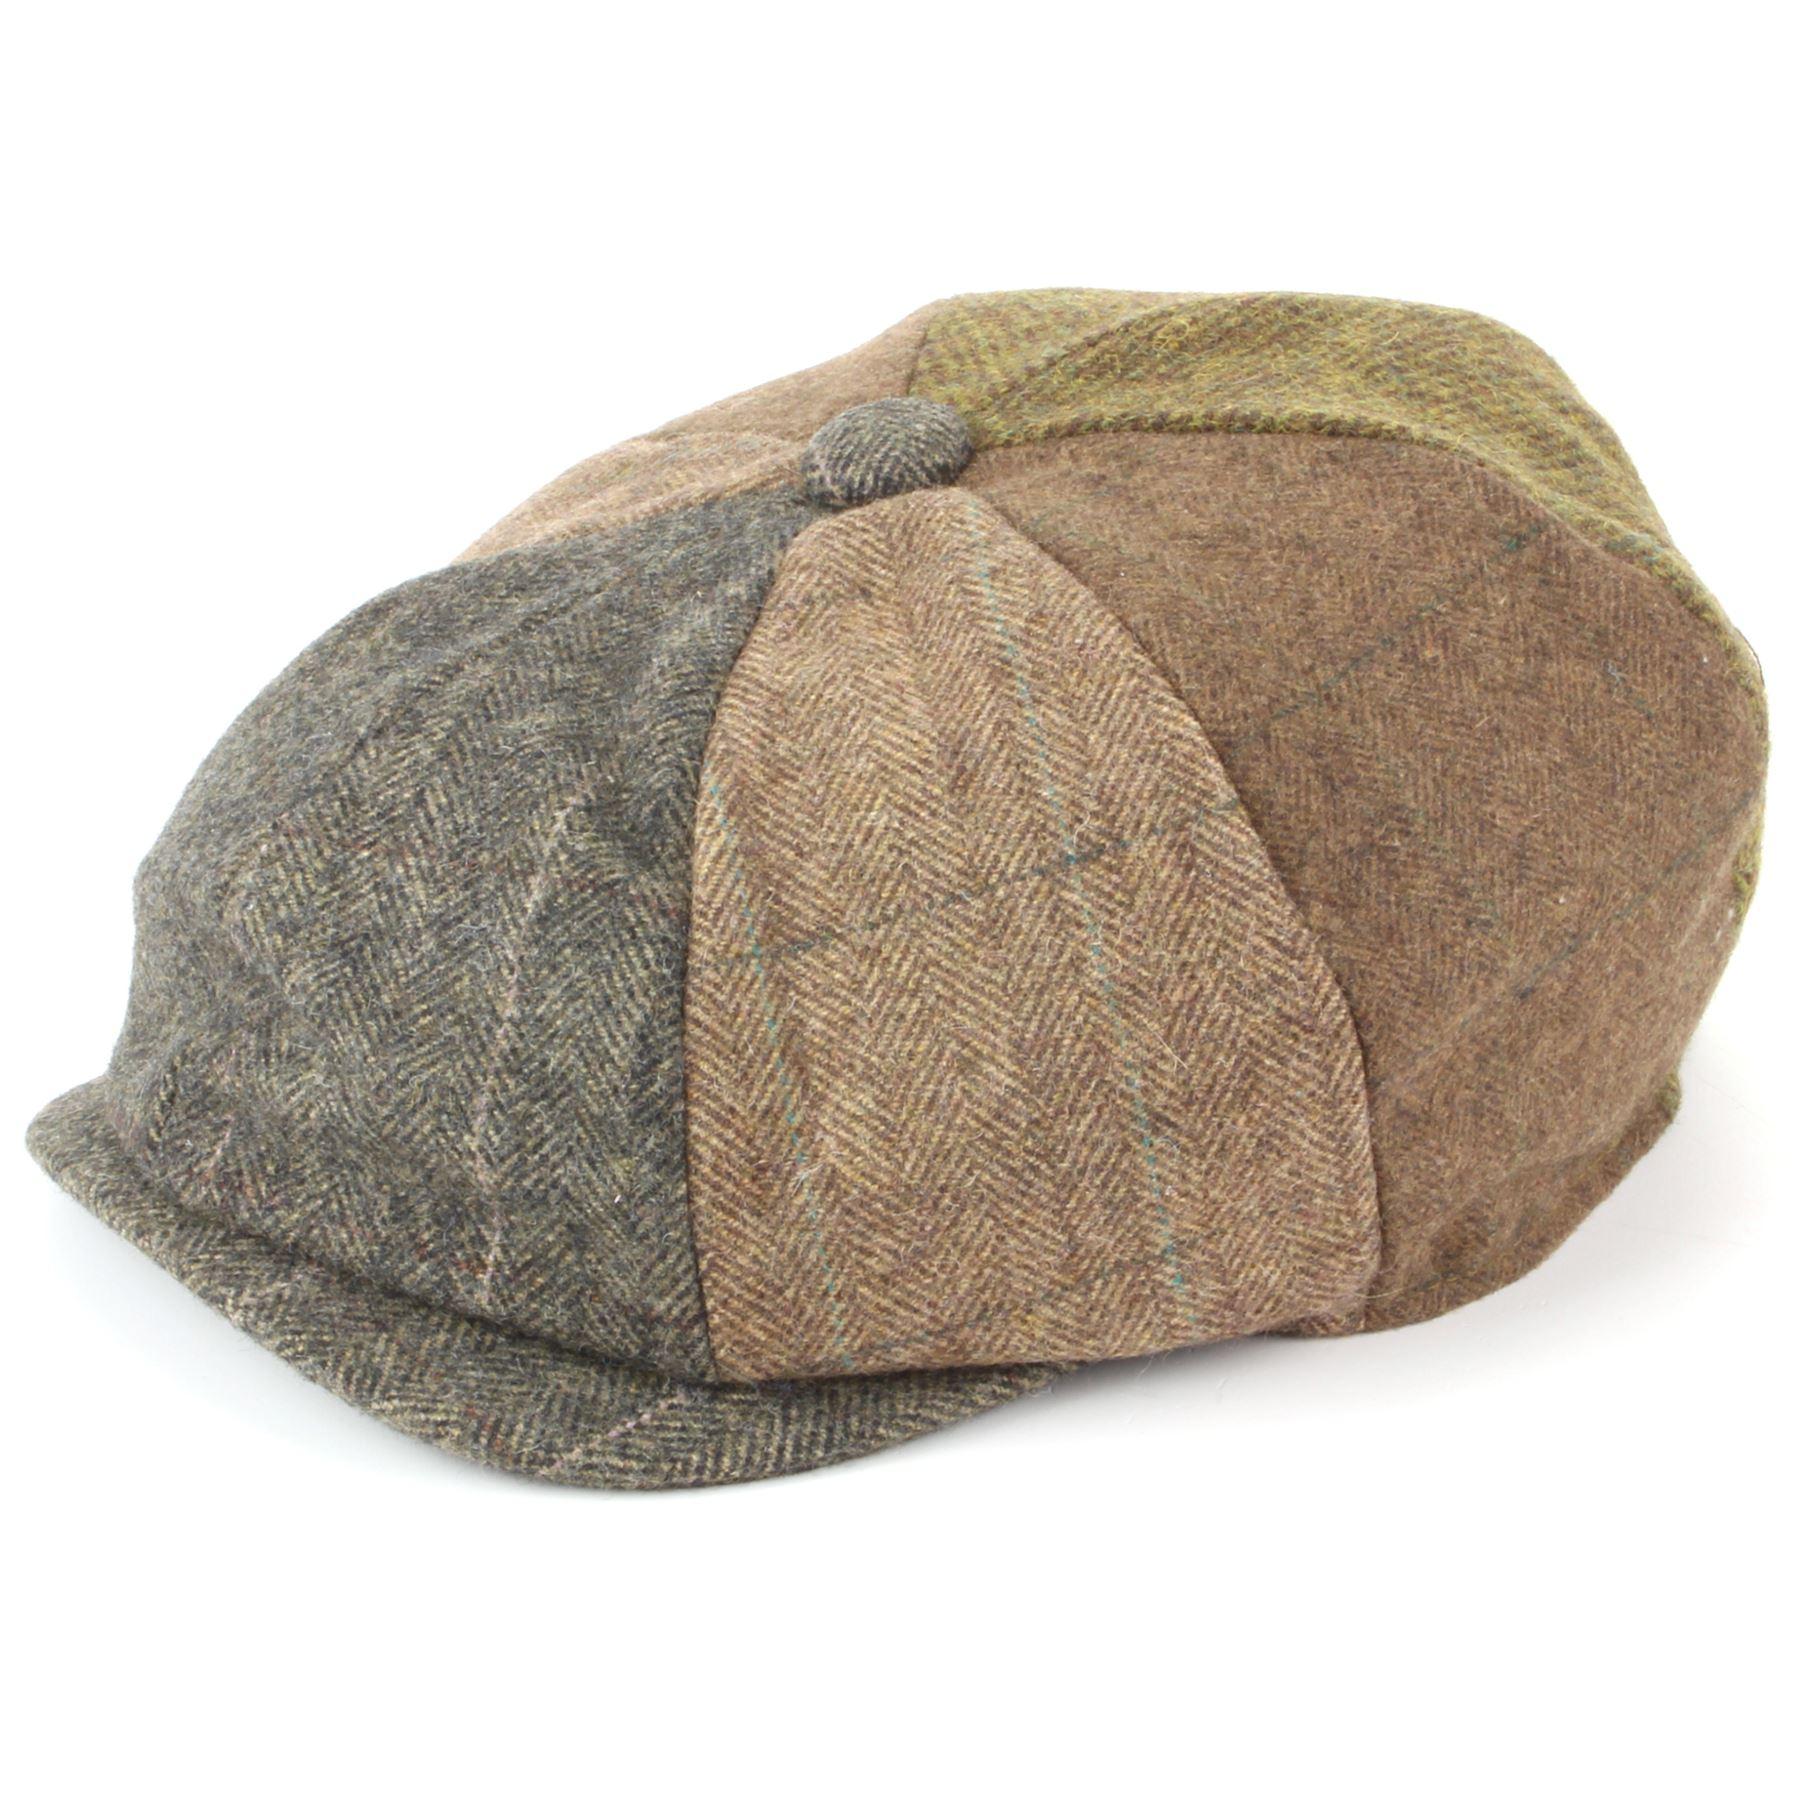 Hawkins Patchwork Tweed Newsboy Gatsby 8 Panel Flat Cap Hat - Brown ... 621c81d3b1d3